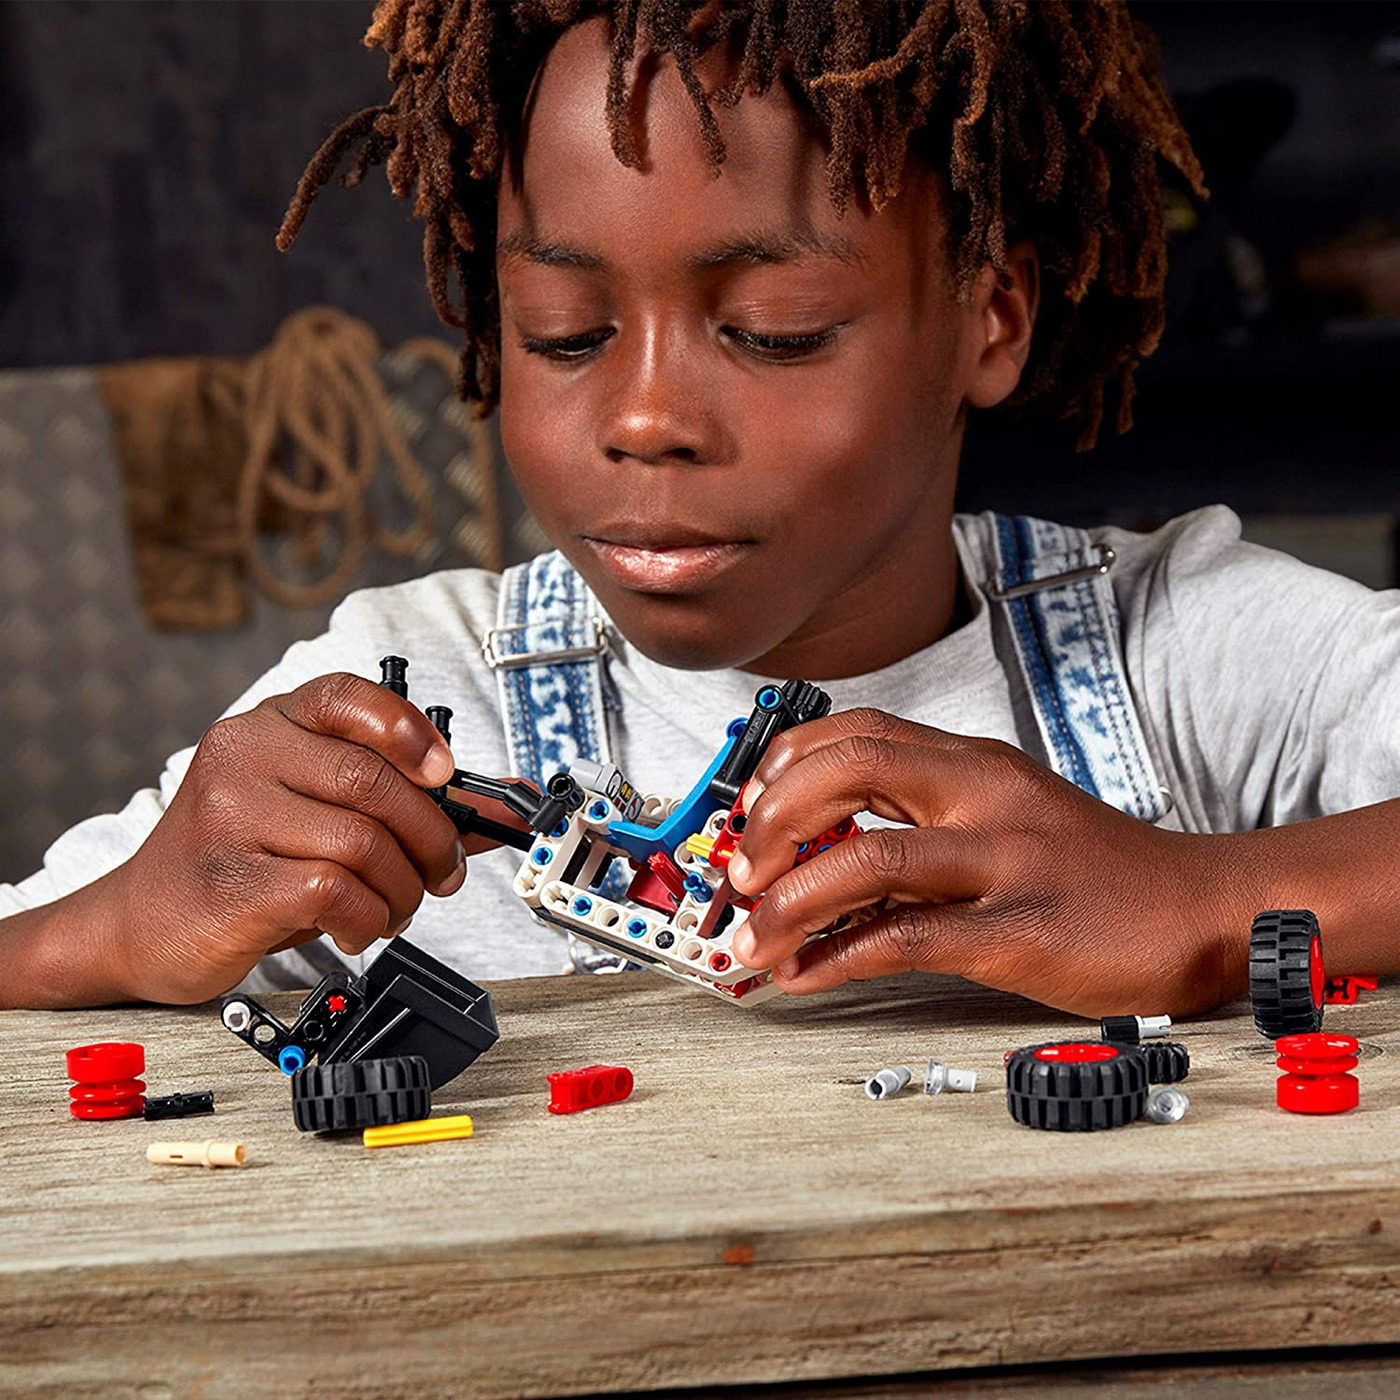 LEGO Technic - Skid Steer Loader (42116)   LEGO - 6